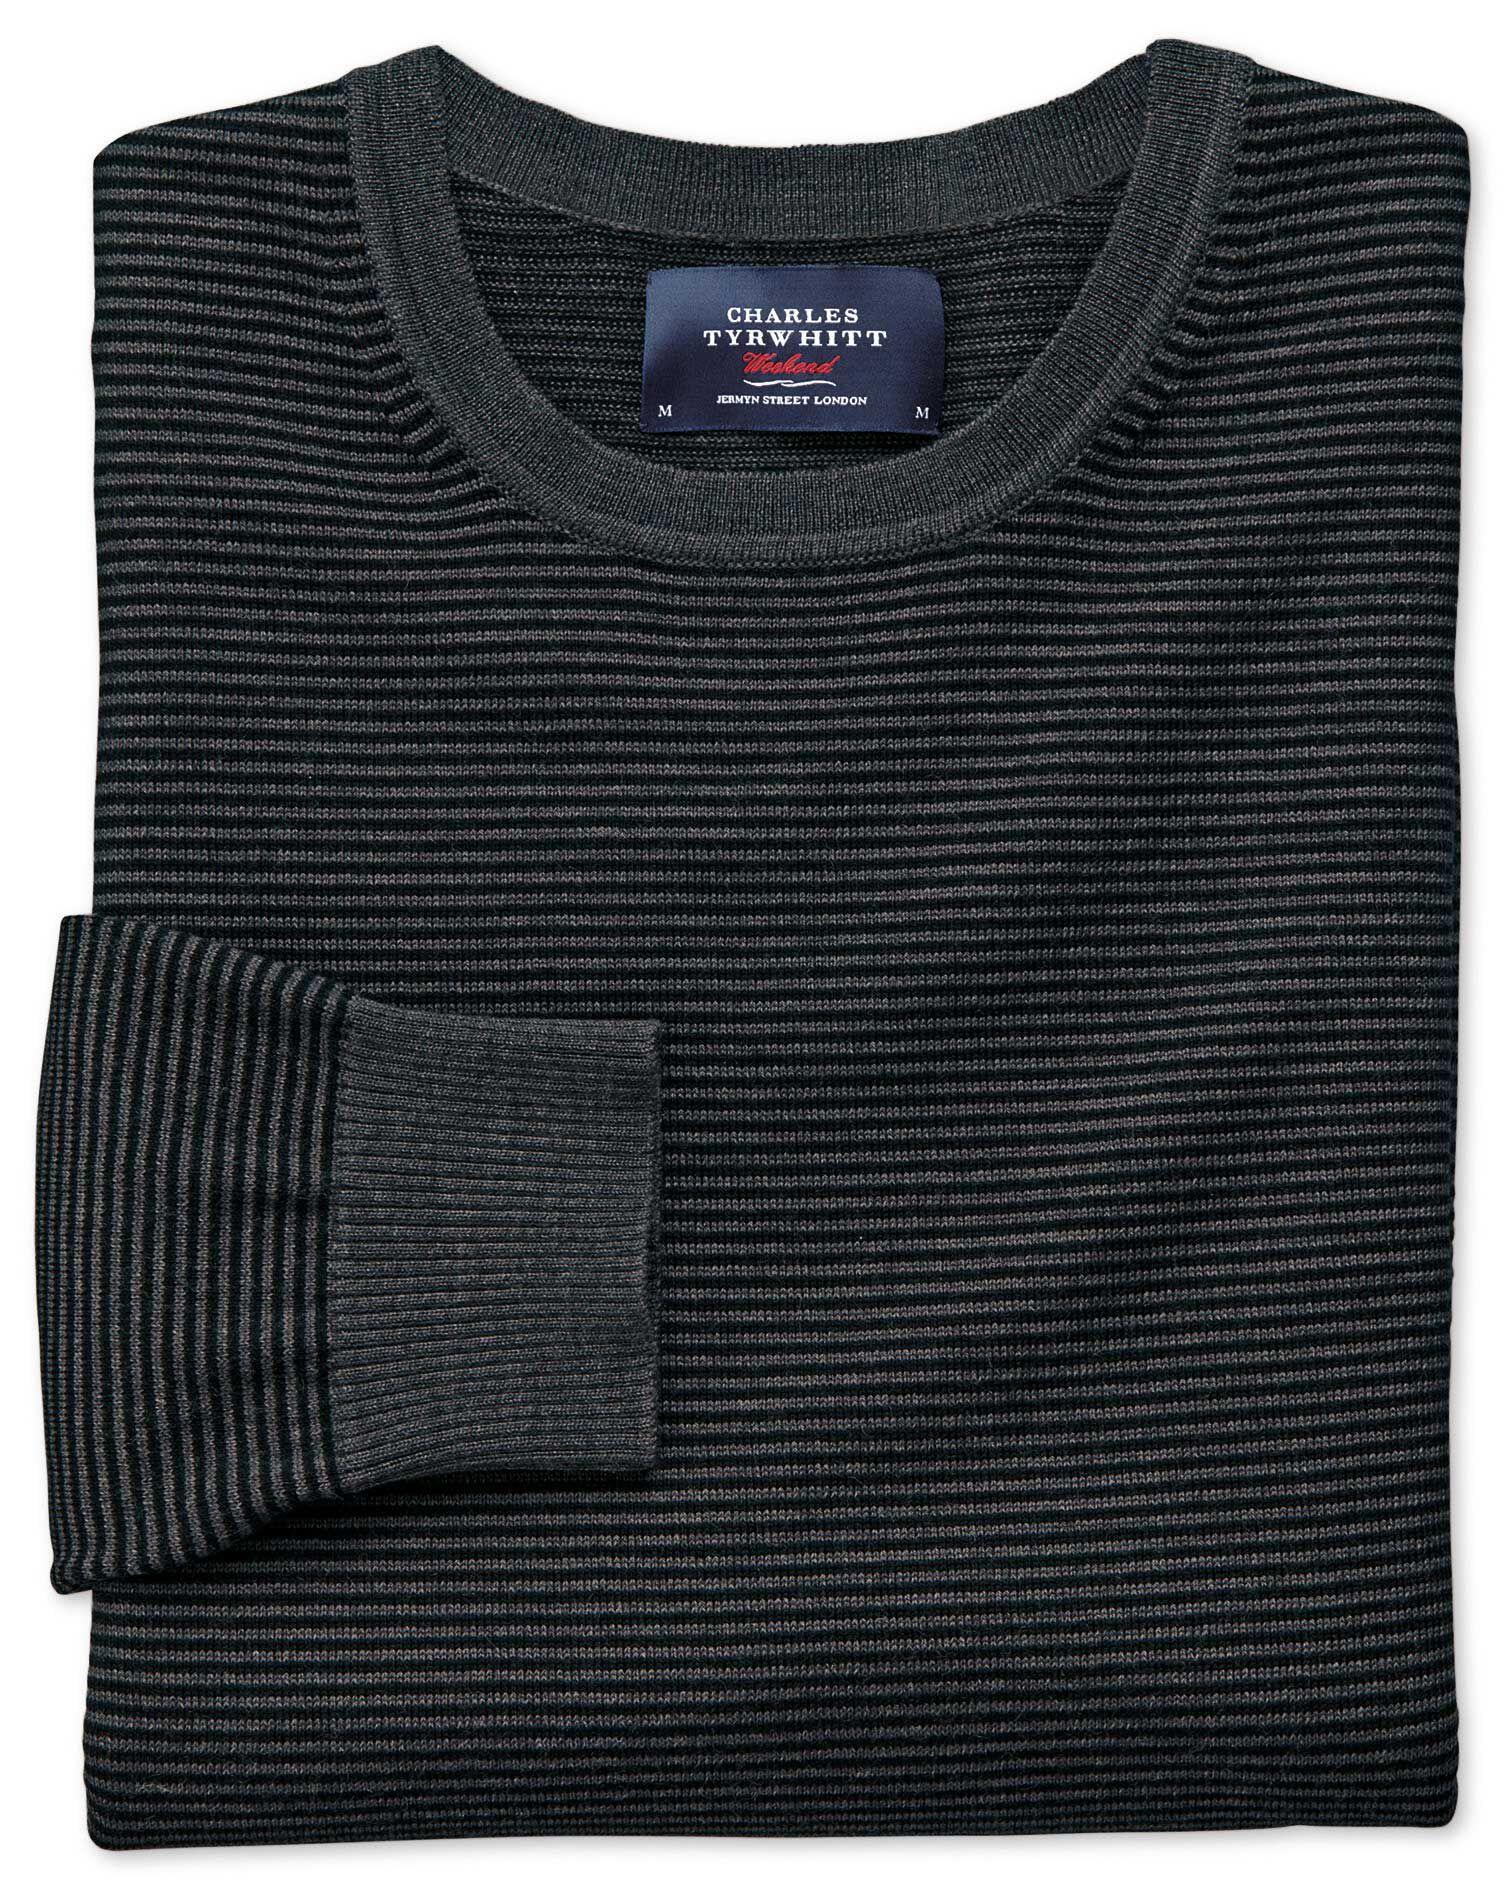 Black and Grey Merino Wool Crew Neck Jumper Size XXXL by Charles Tyrwhitt